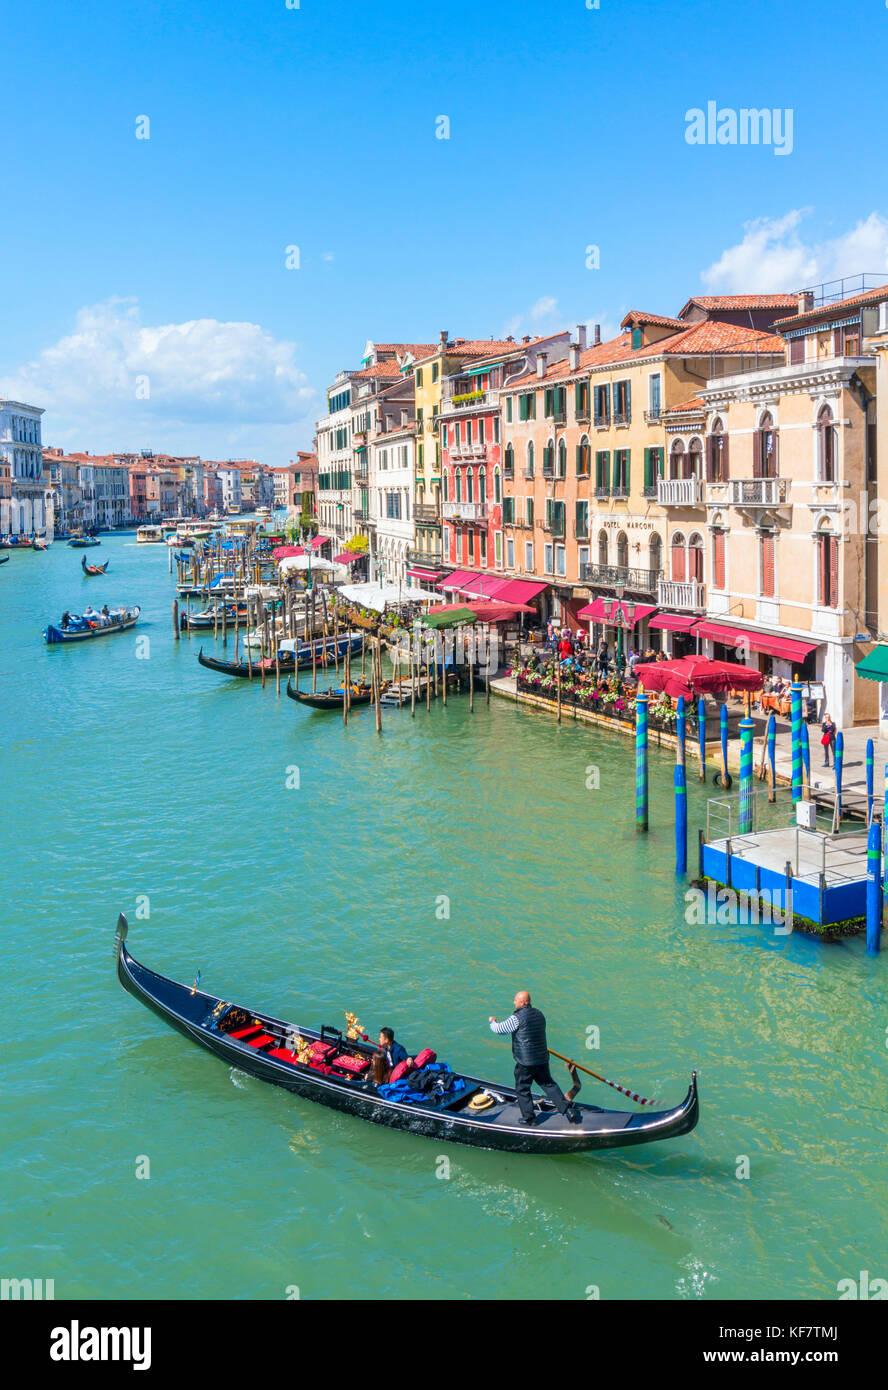 VENICE ITALY VENICE Gondolier rowing a gondola full of tourists on a gondola ride on the grand canal Venice Italy - Stock Image